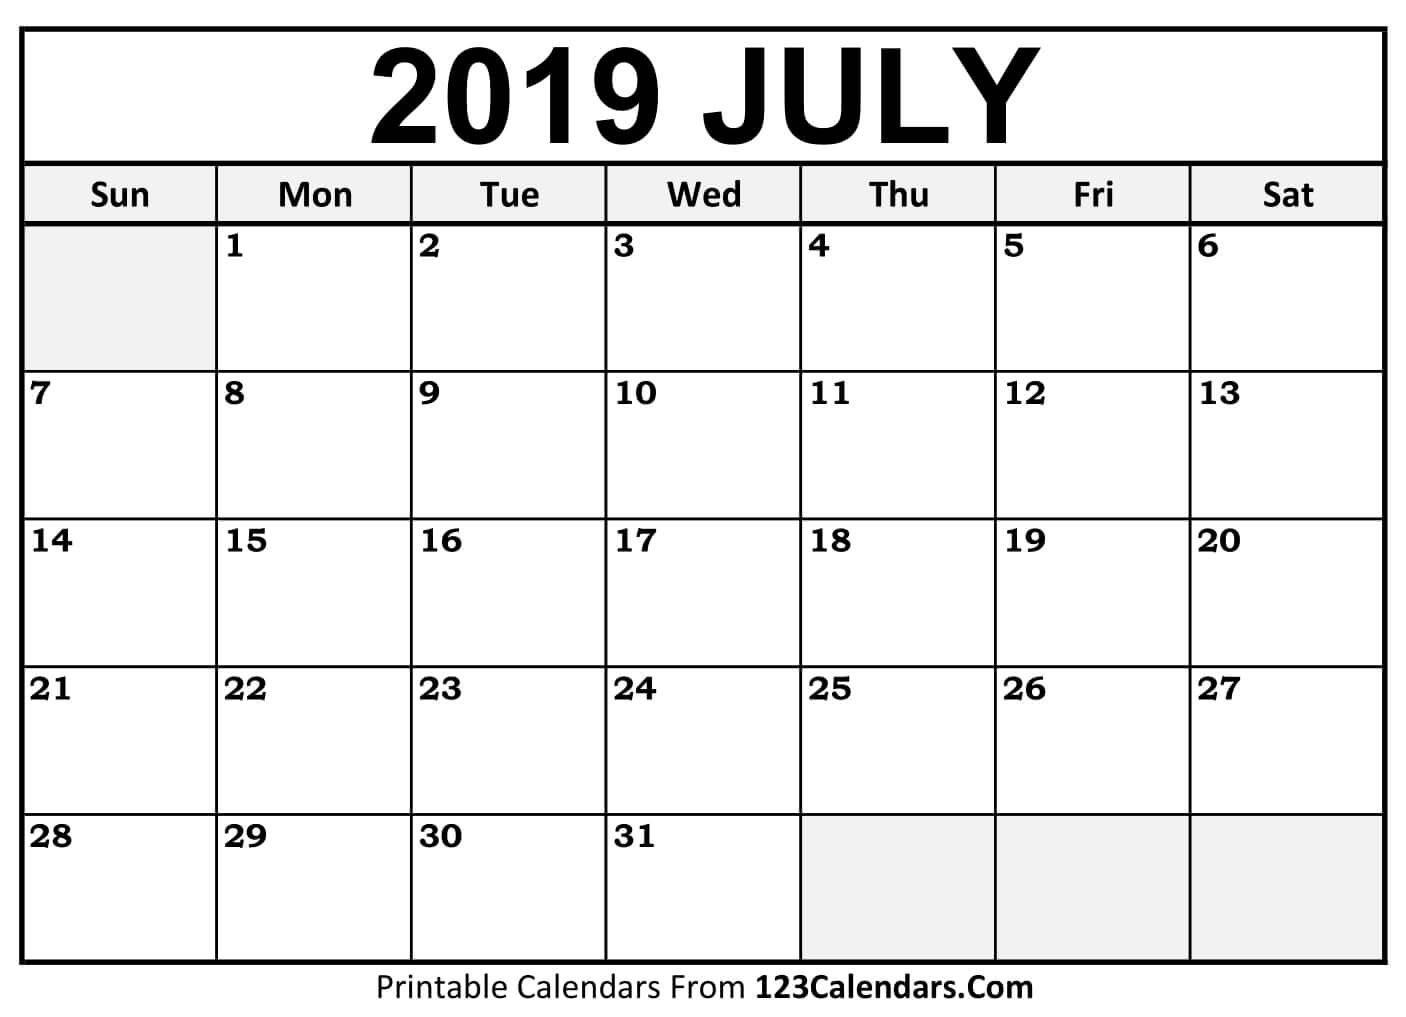 Printable July 2019 Calendar Templates - 123Calendars July 2 2019 Calendar